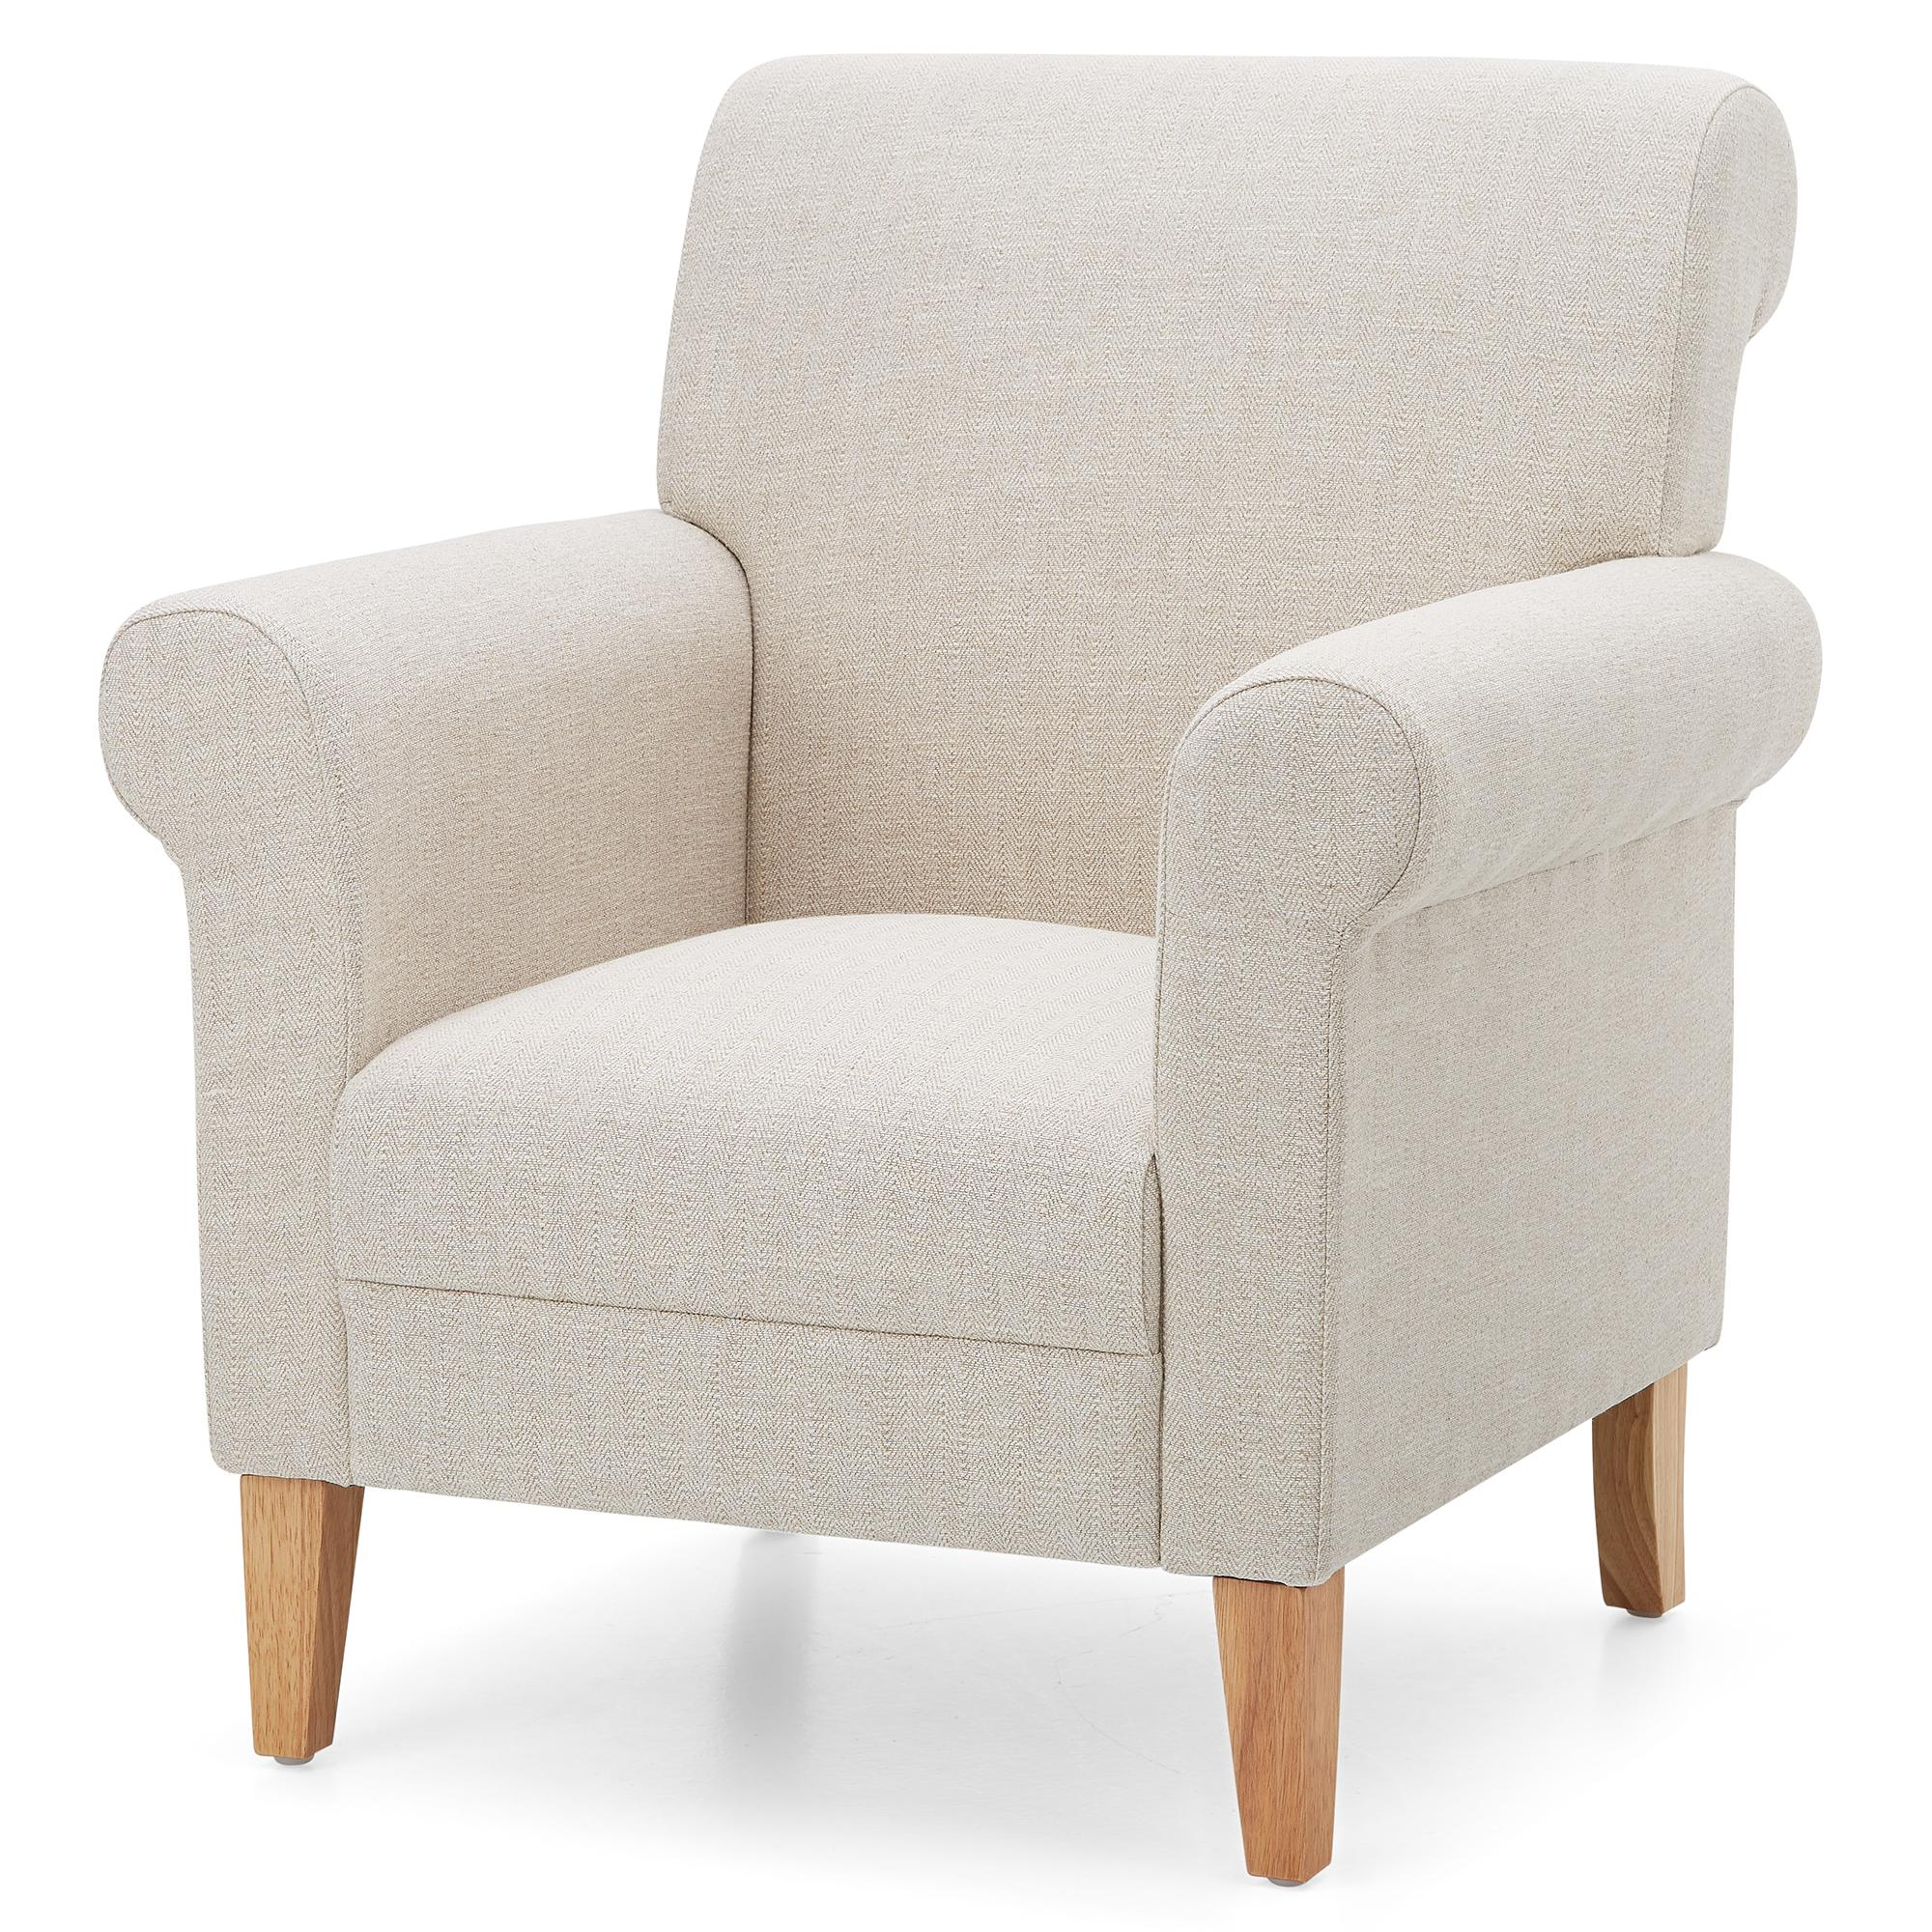 Valencia Herringbone Armchair - Cream | Dunelm